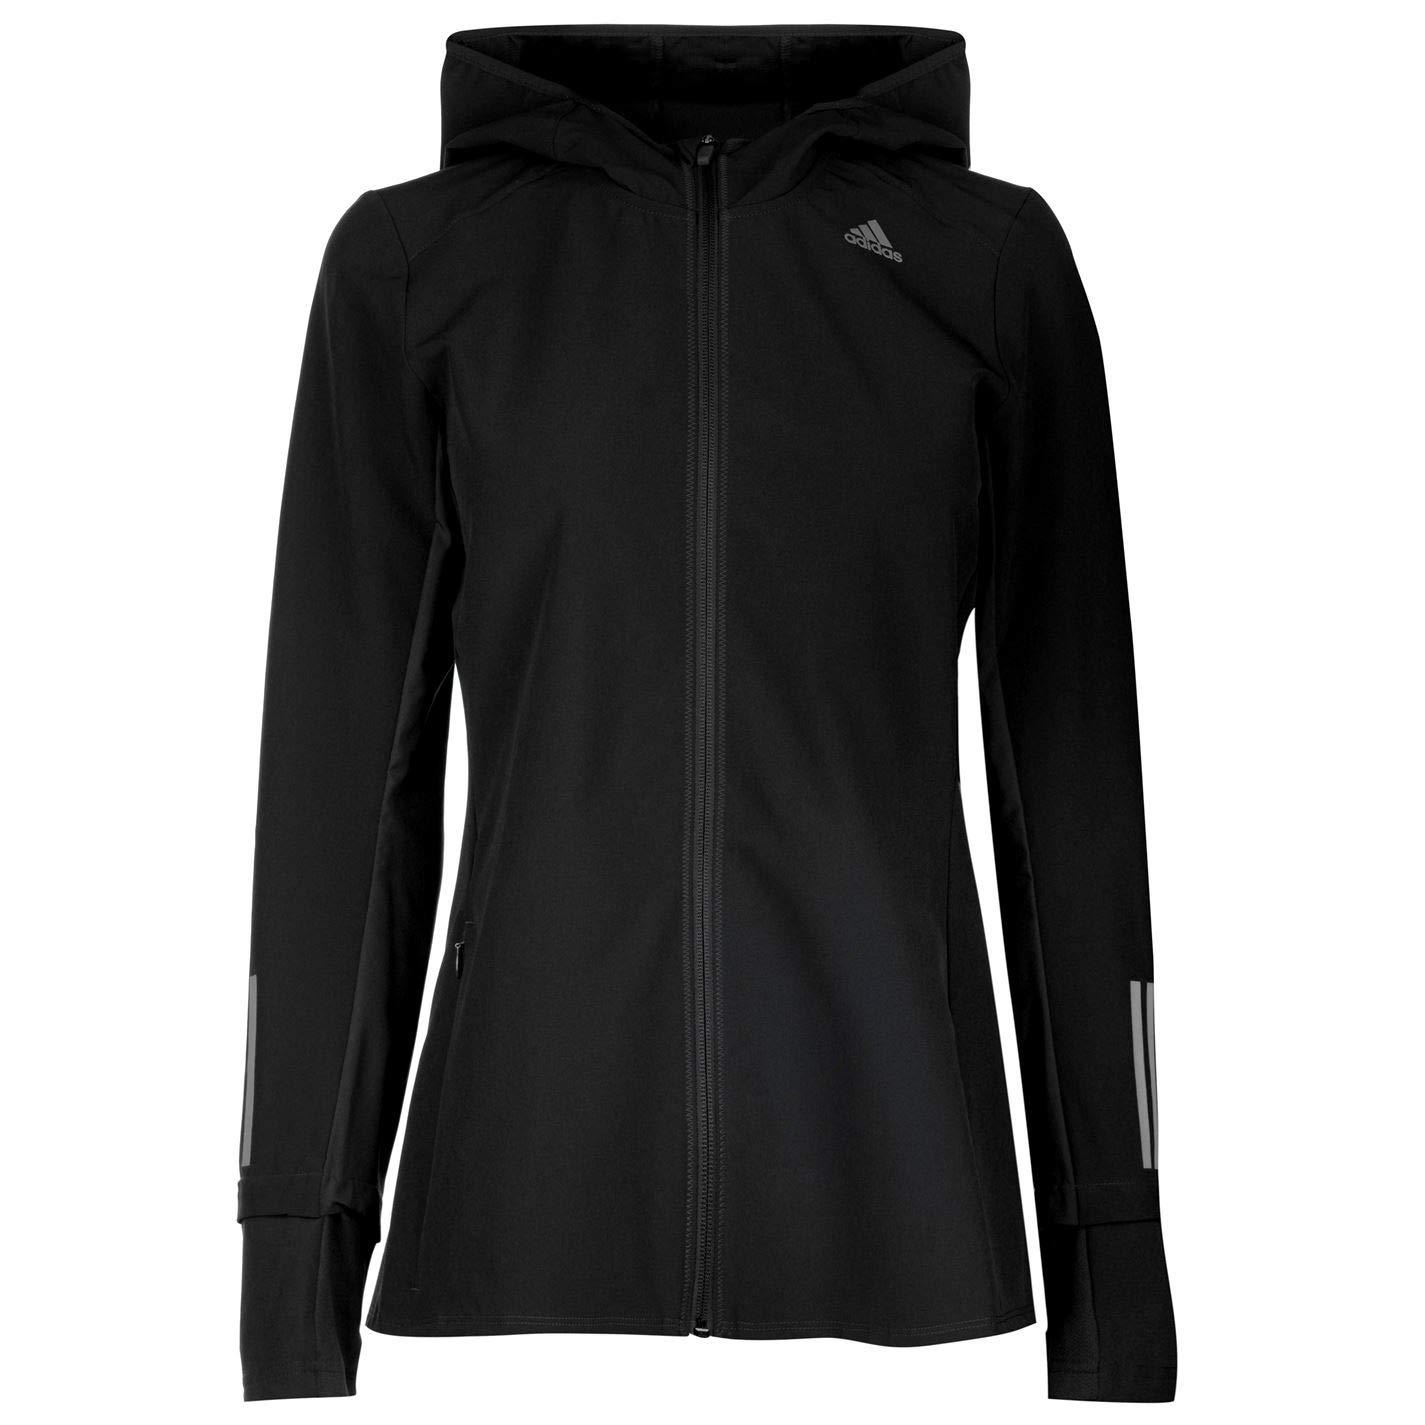 Adidas Response Jacket Chaqueta, Mujer CZ3519